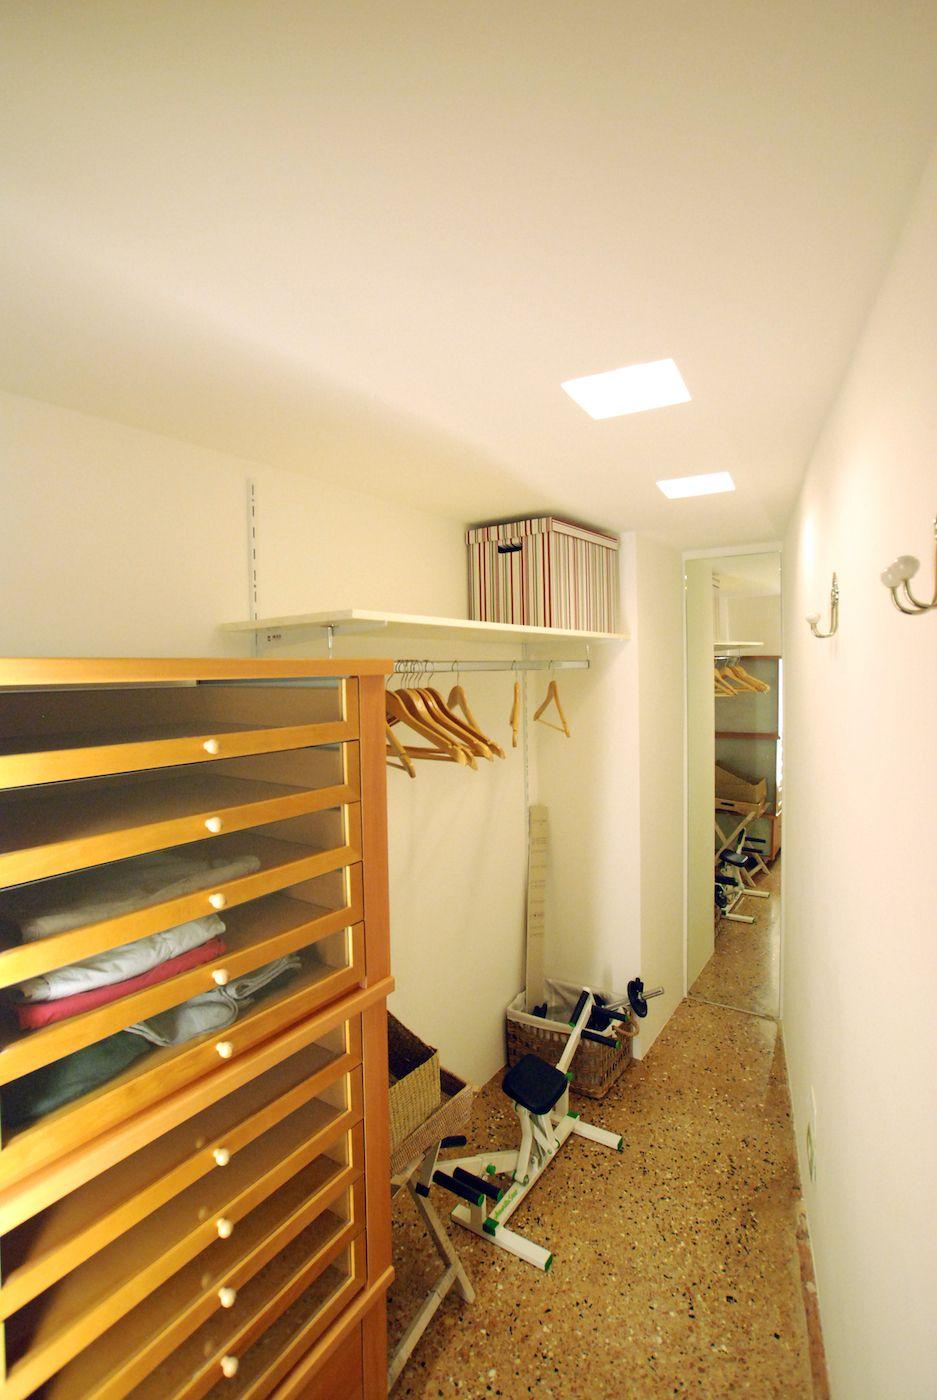 second bedroom walk-in wardrobe